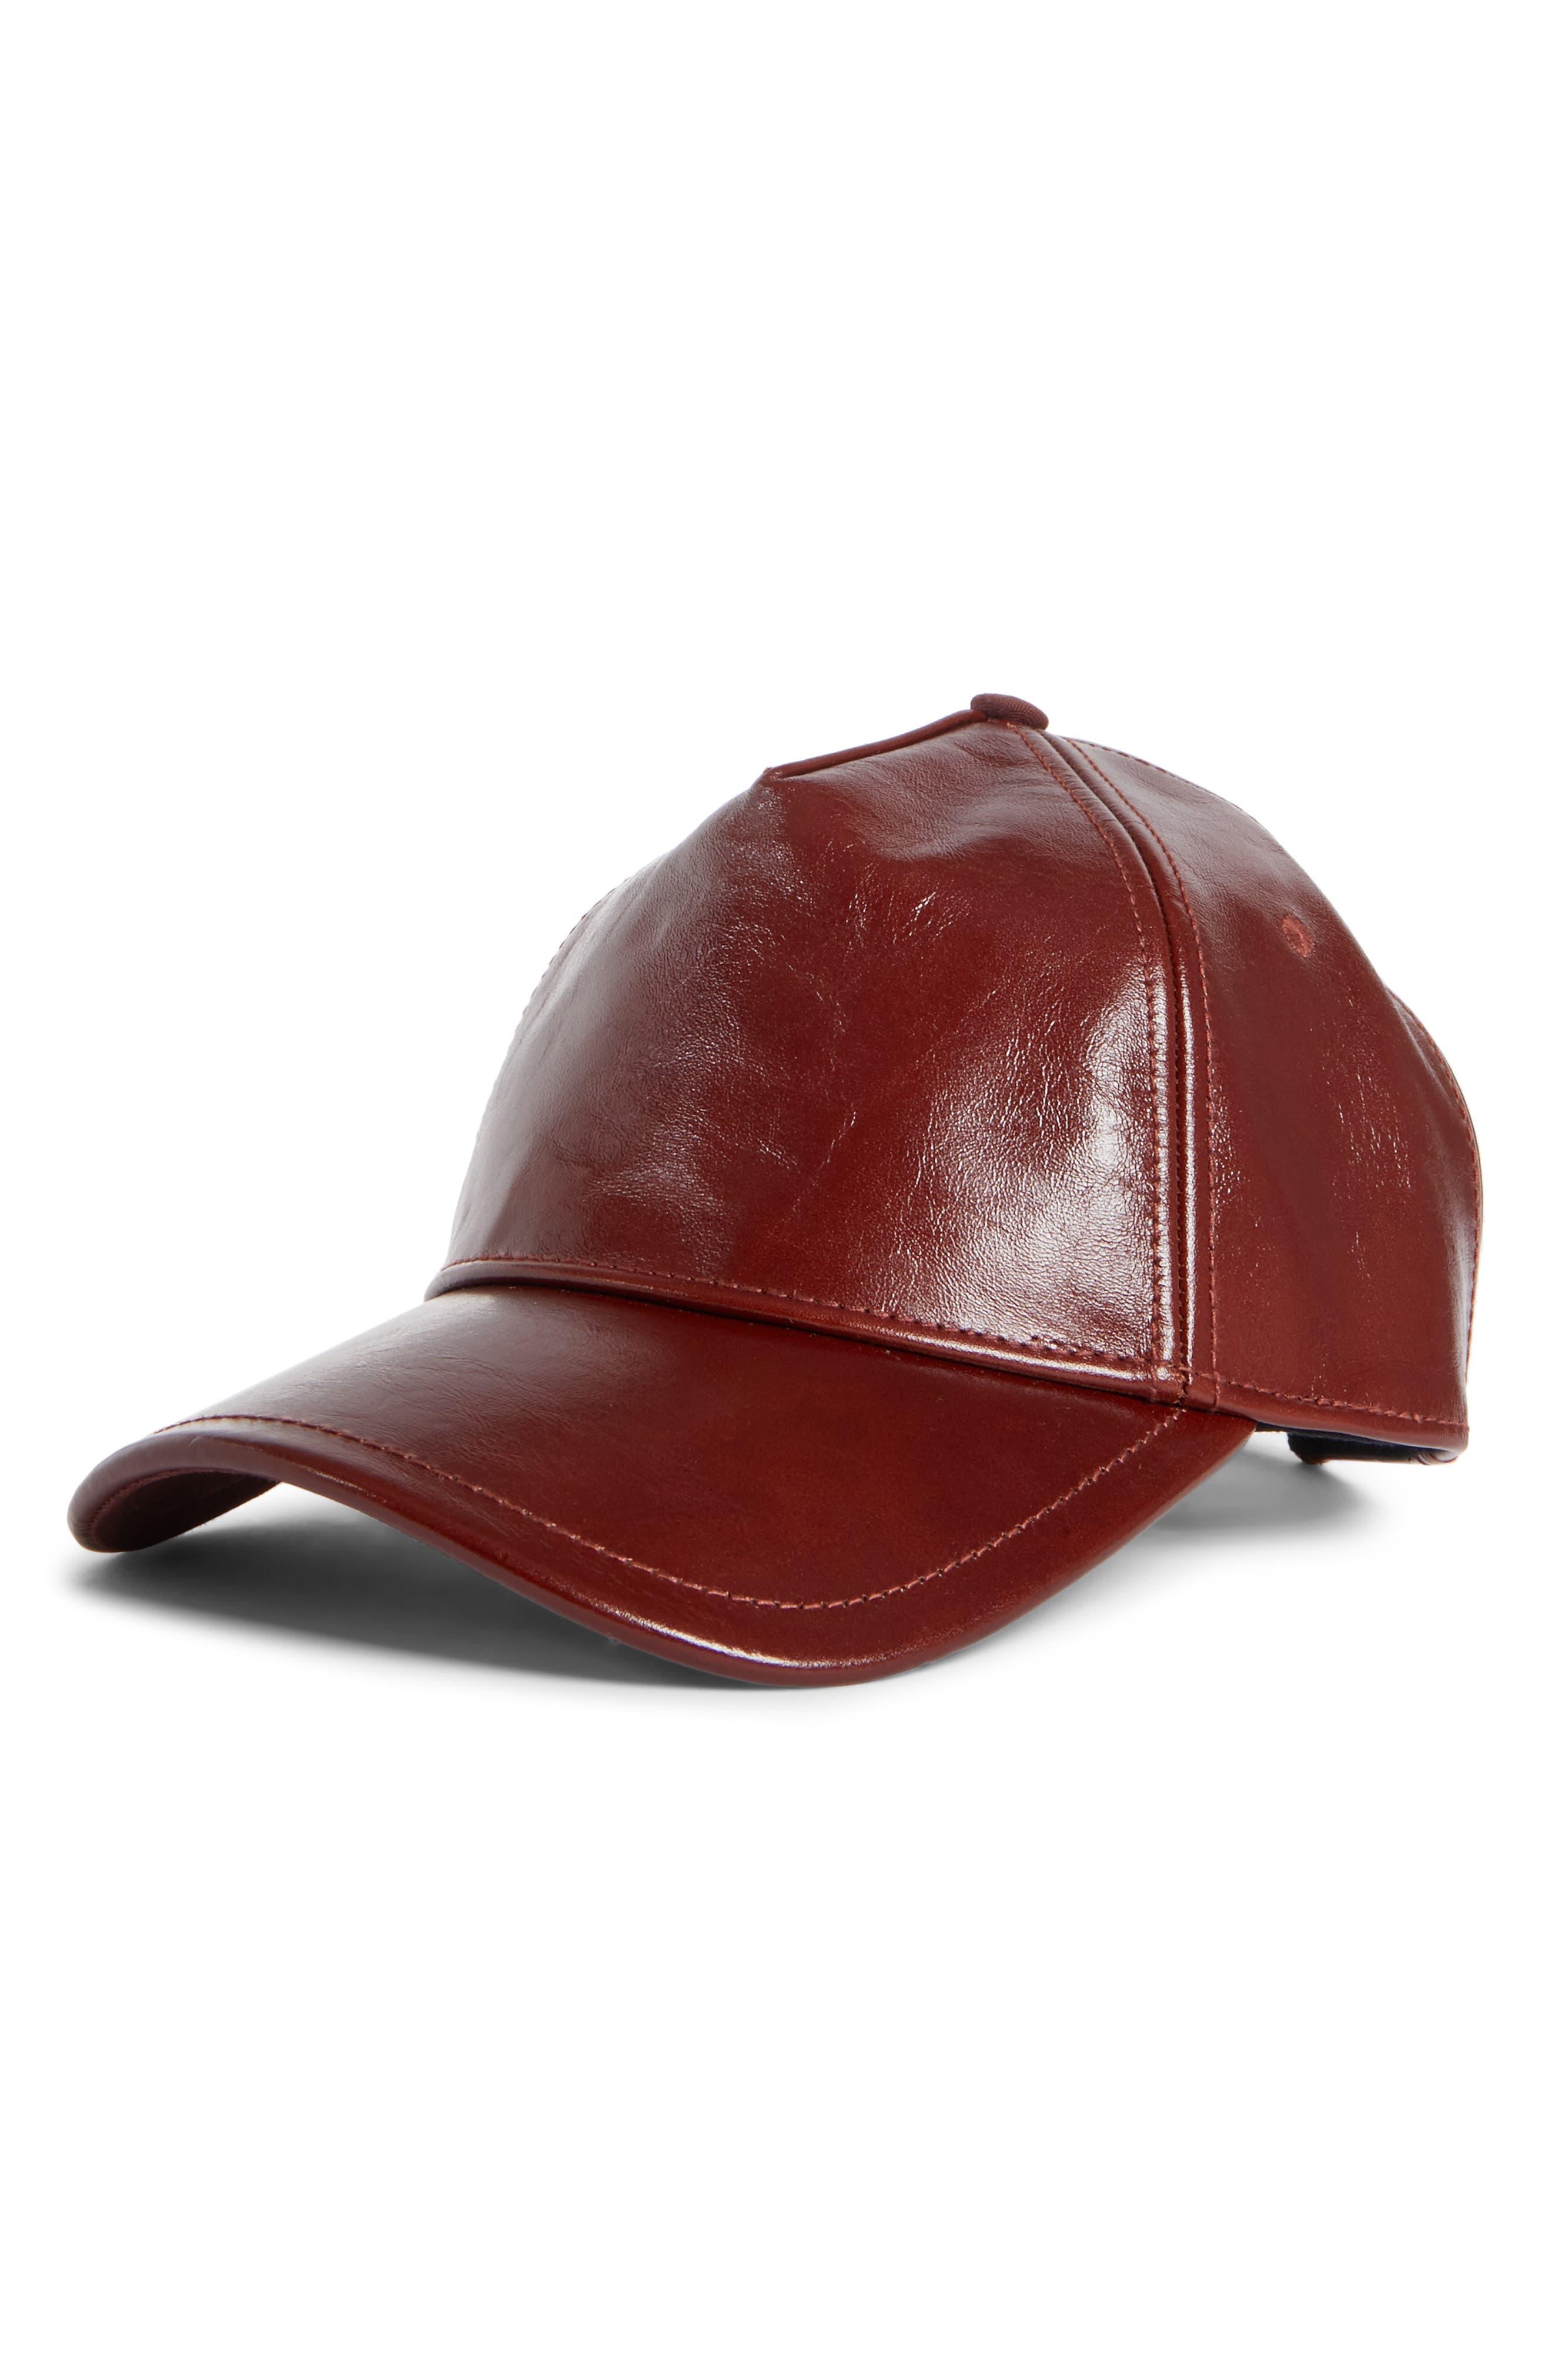 Marilyn Leather Baseball Cap,                             Main thumbnail 1, color,                             DARK BROWN